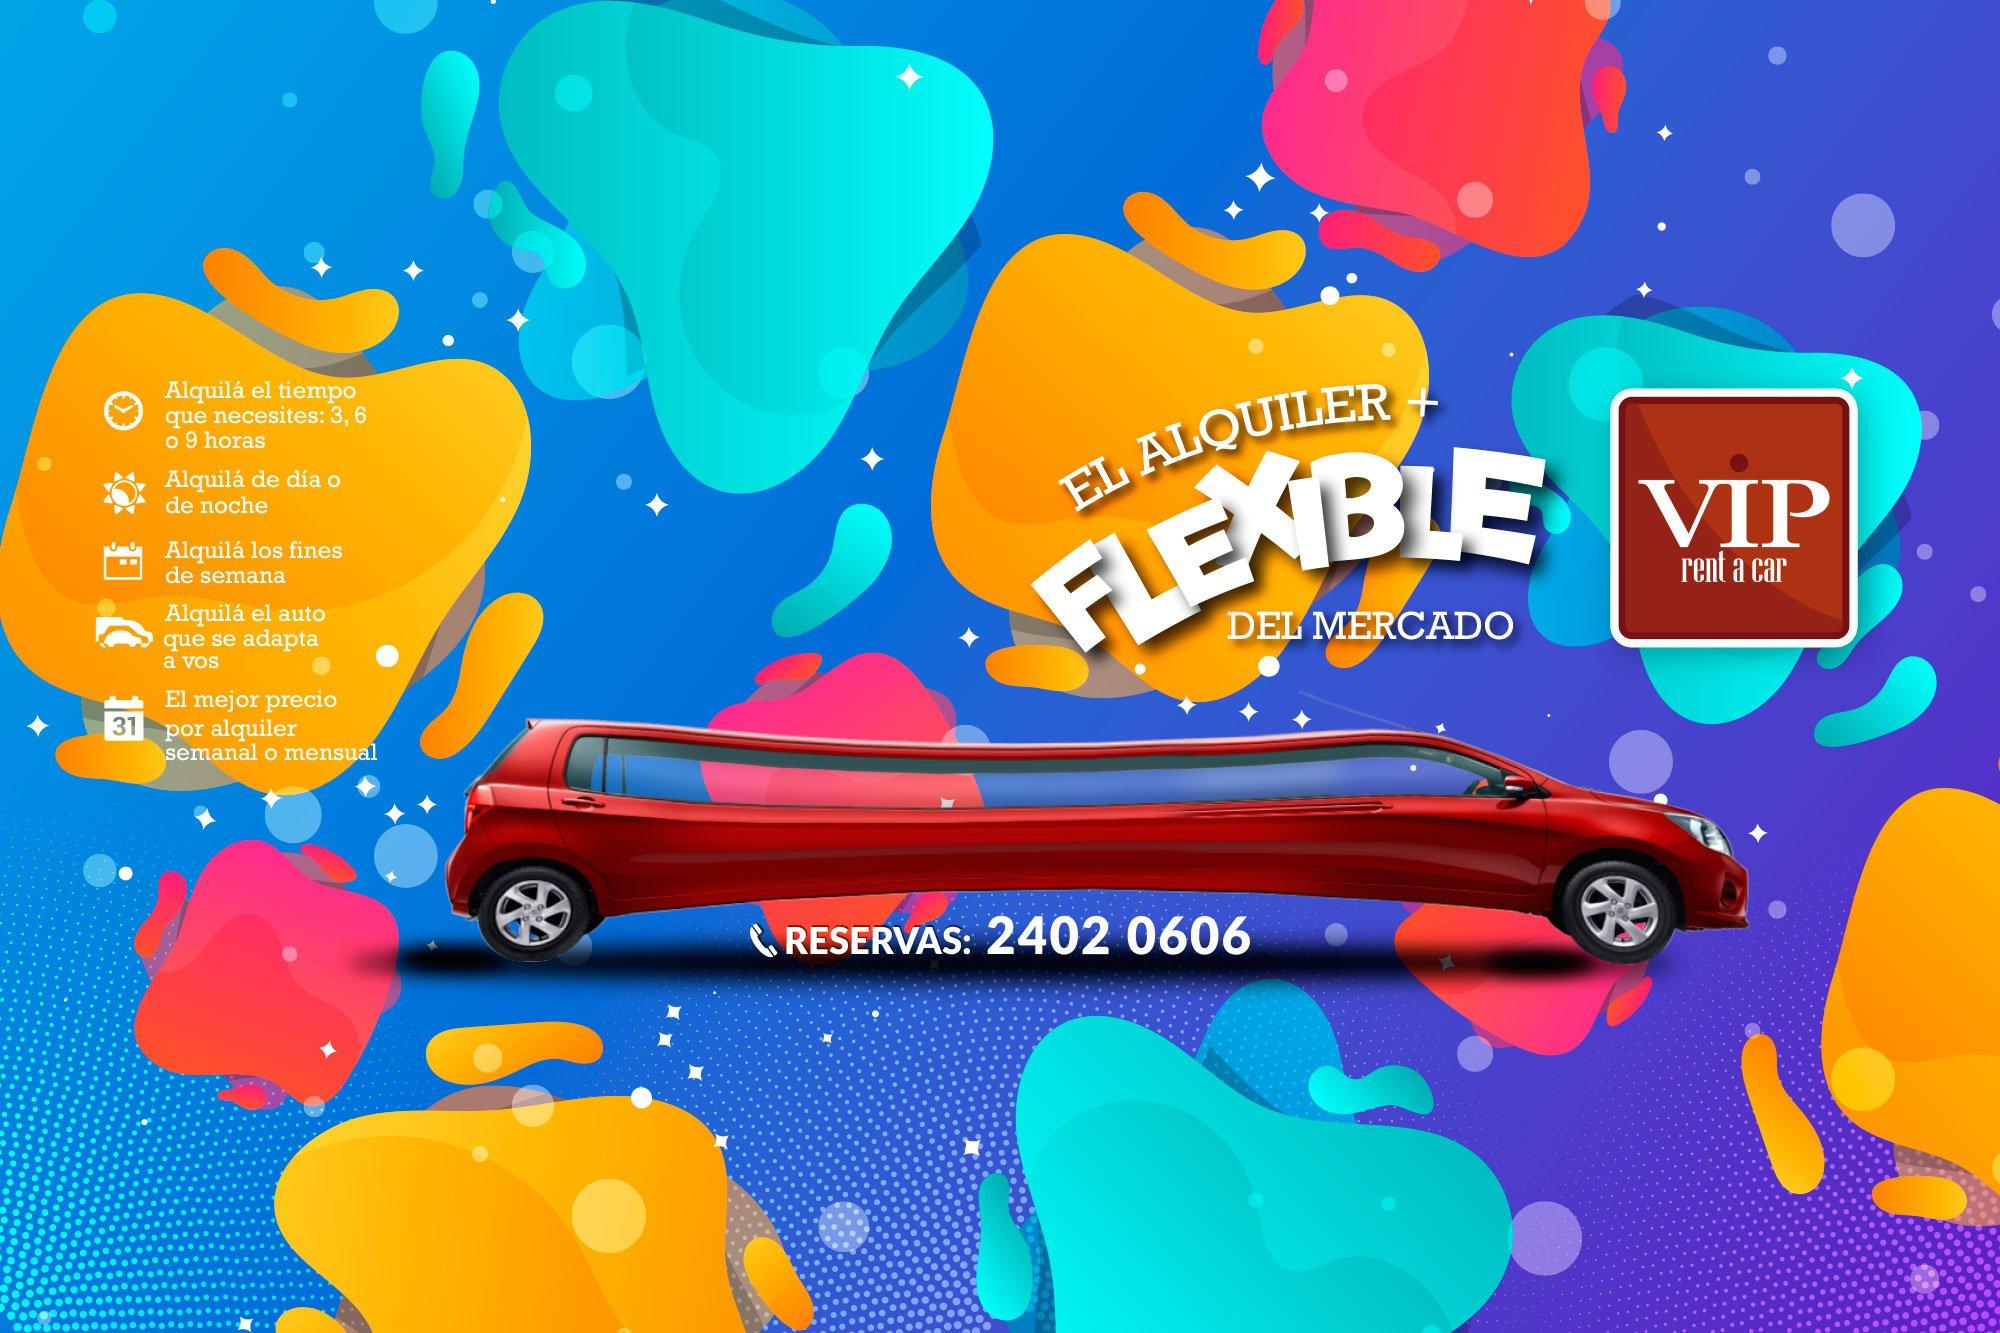 Flexible-VIP-Nueva-Web-2021-v2